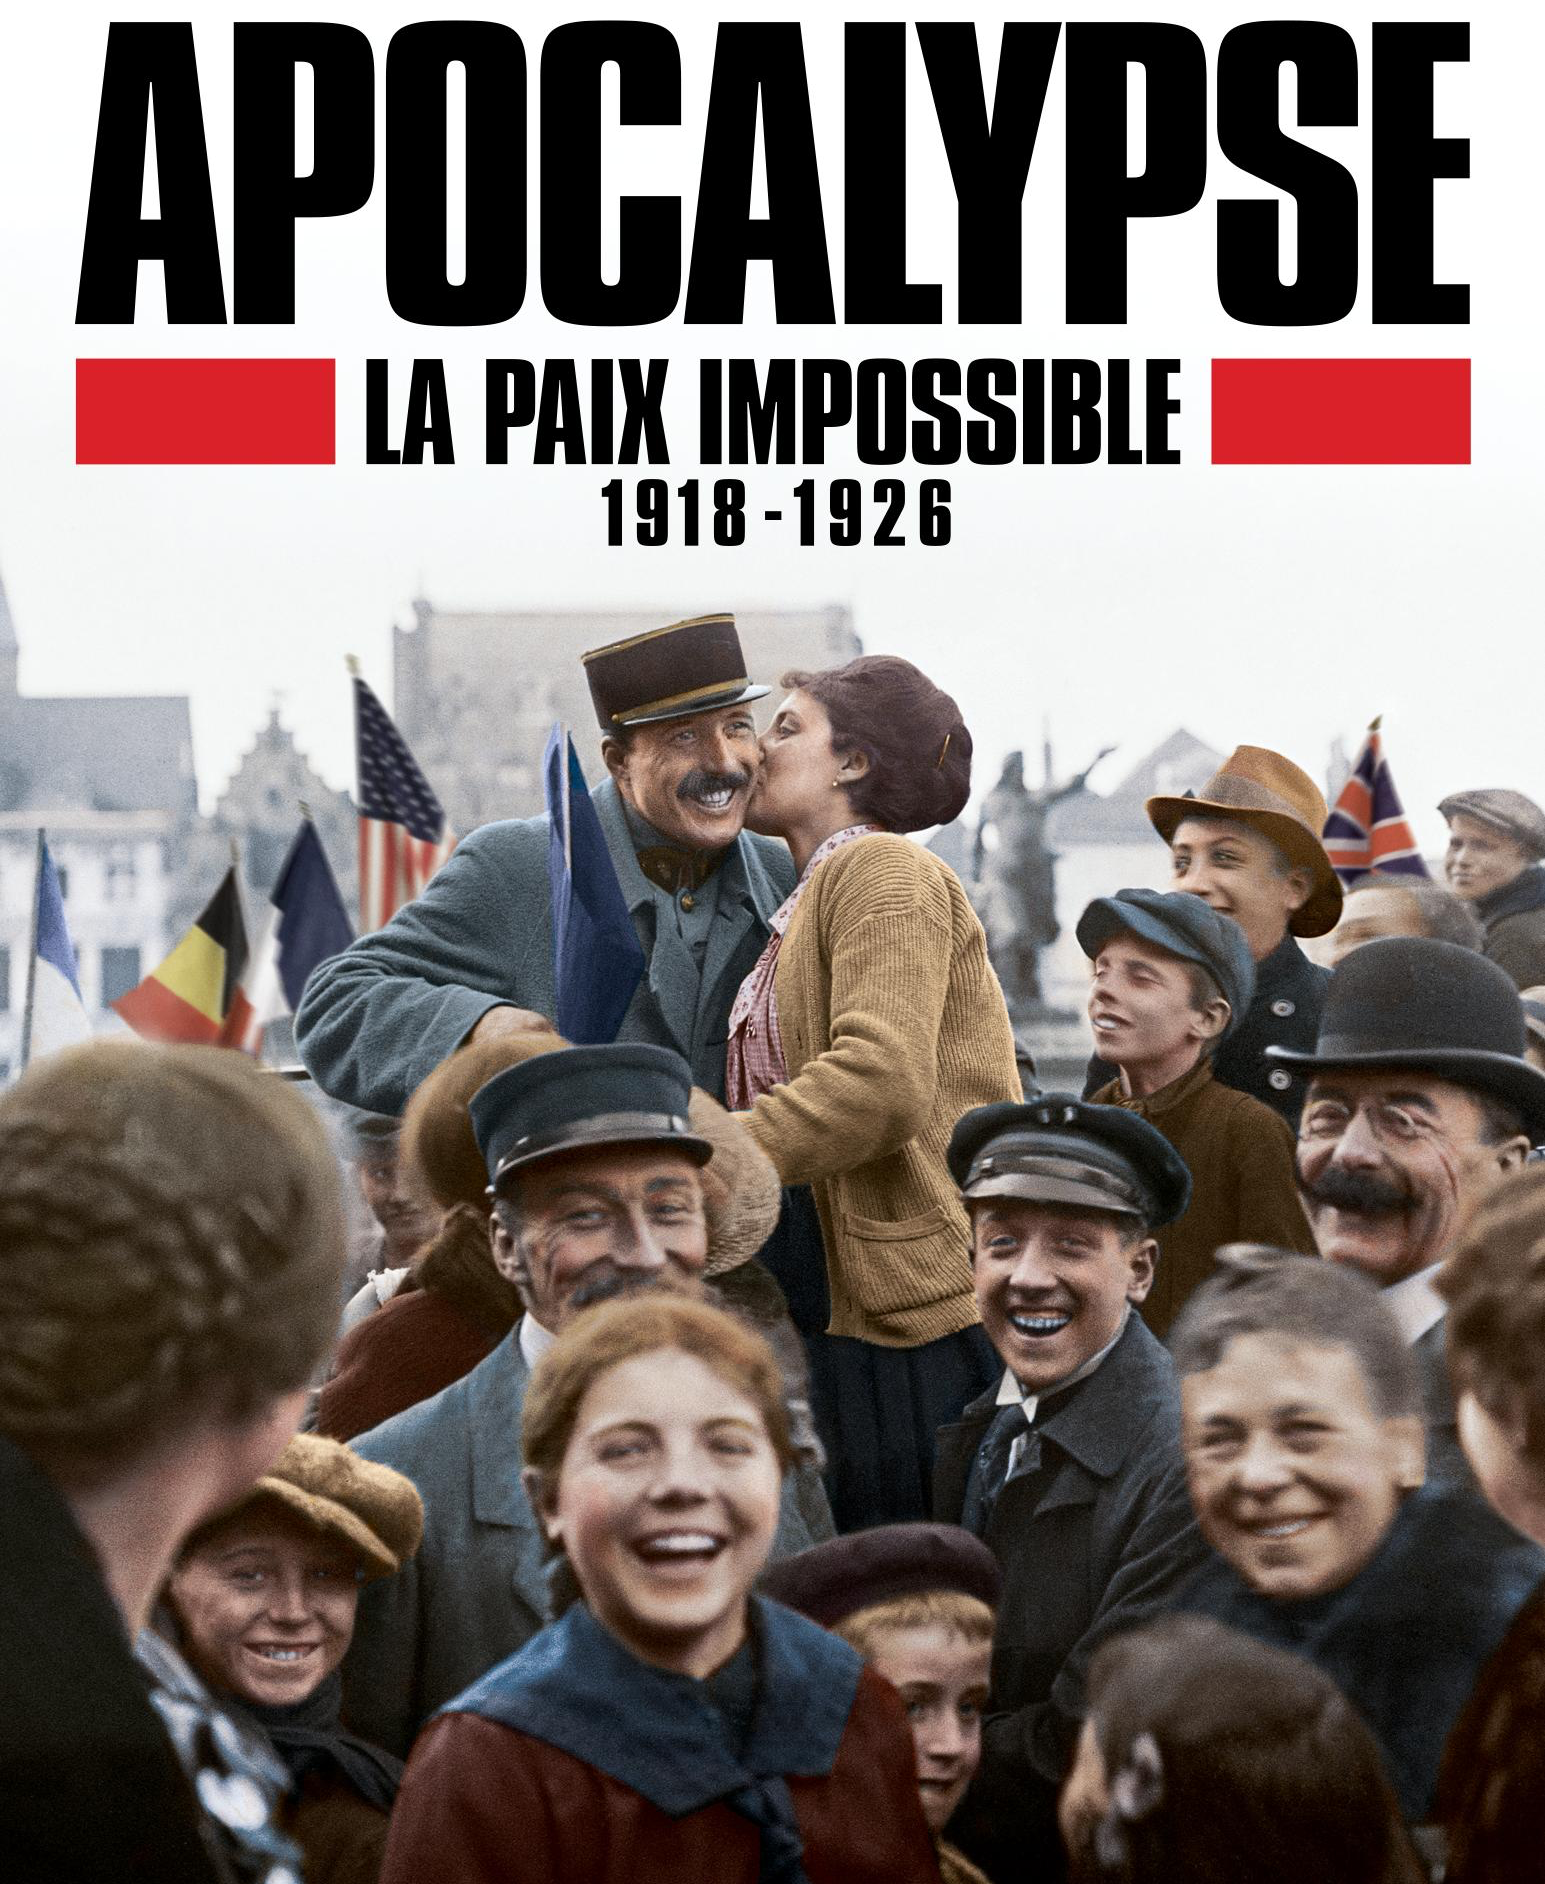 Apocalypse La paix impossible